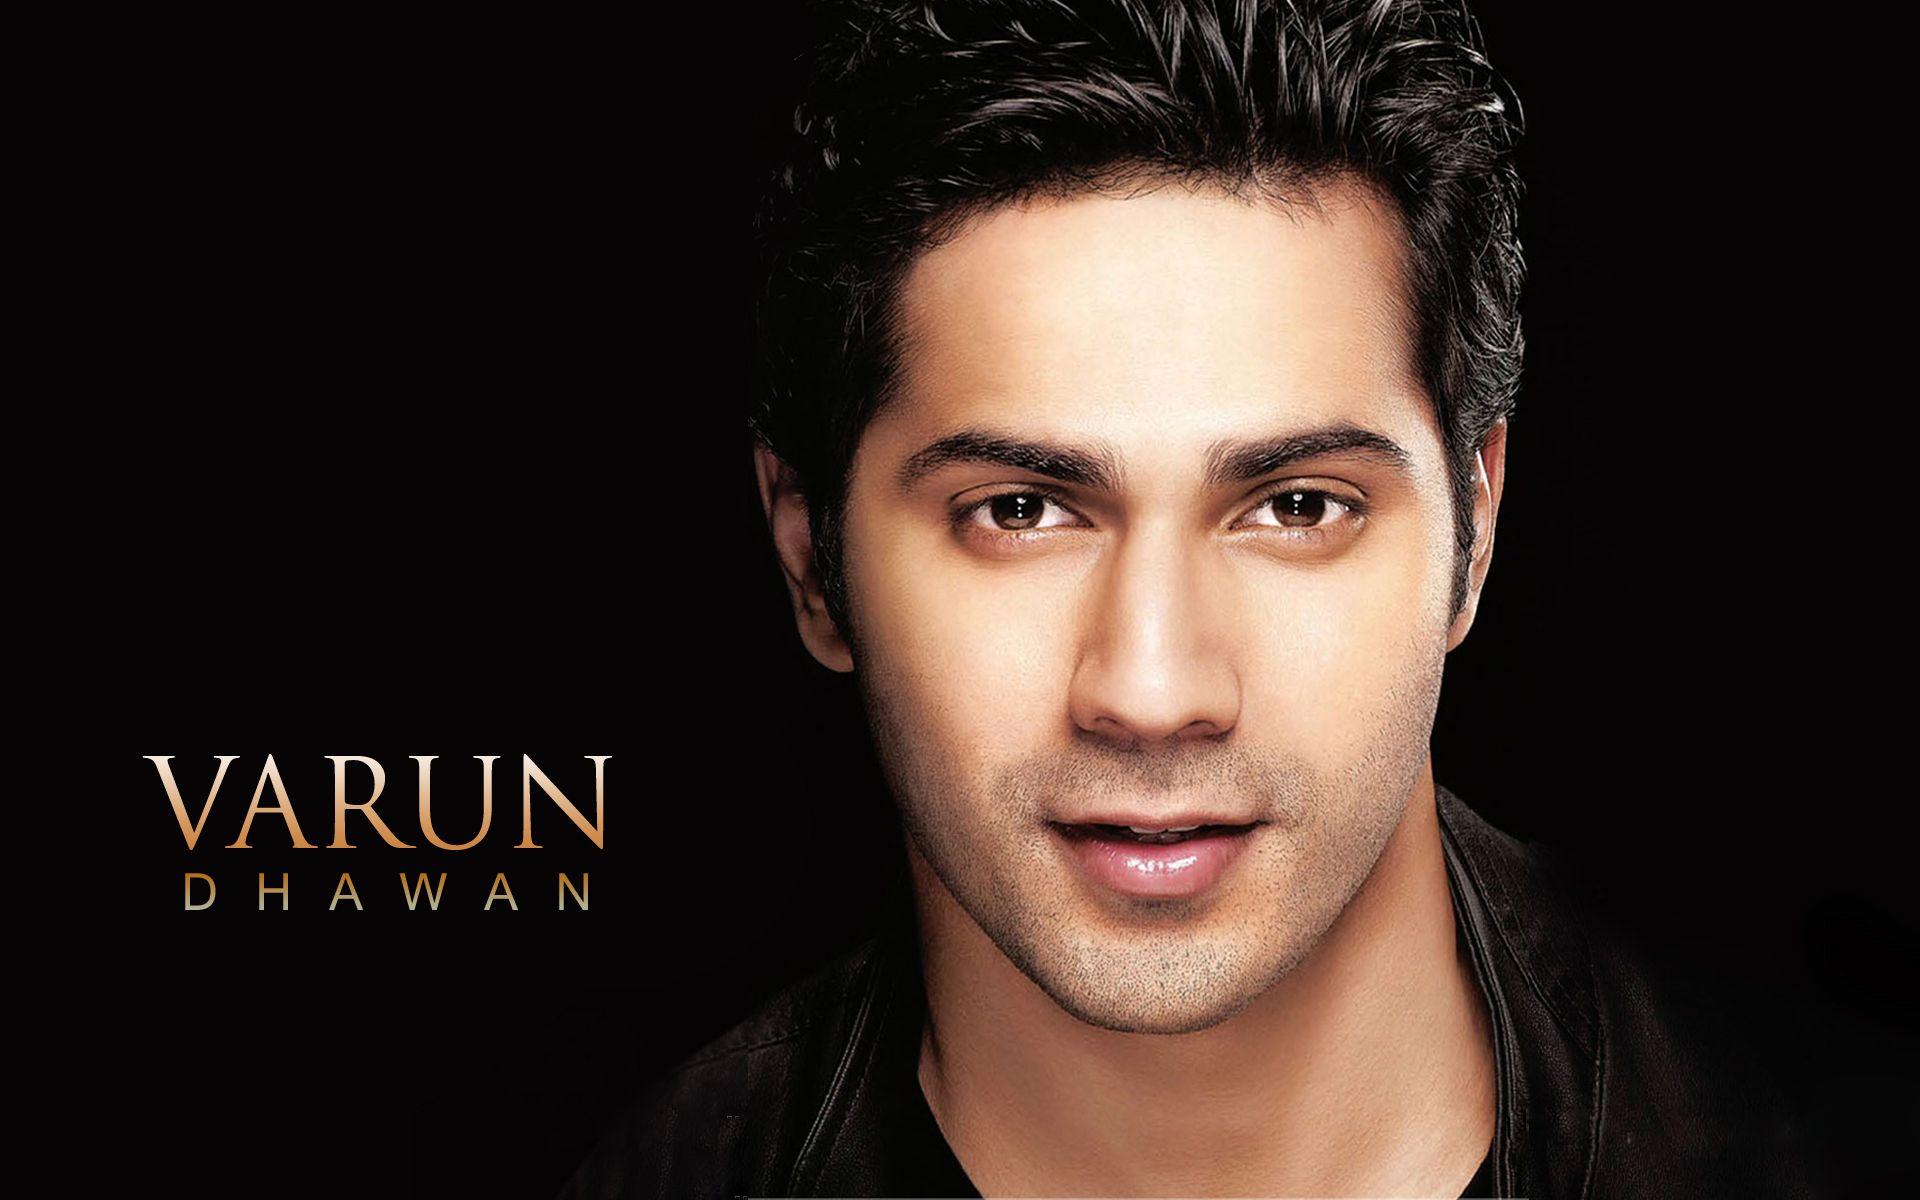 Wallpaper download bollywood actors - Varun Dhawan Bollywood Actors Wallpapers Download Free Mrpopat